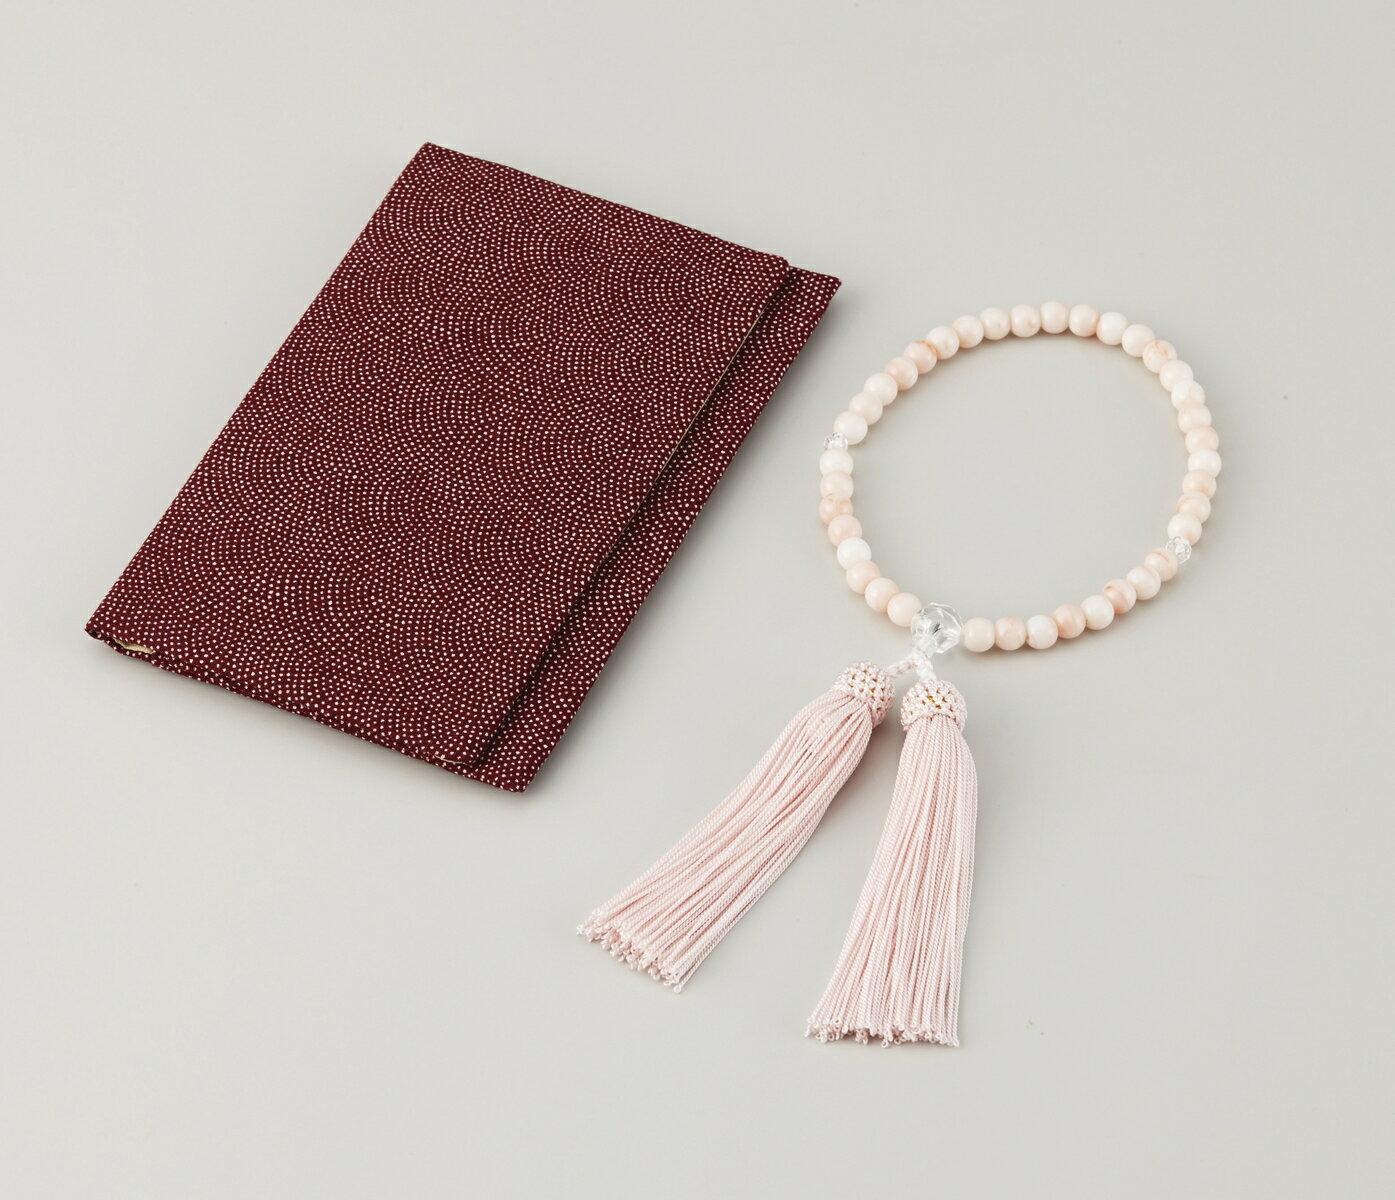 珊瑚調京念珠・念珠袋セット 女性用